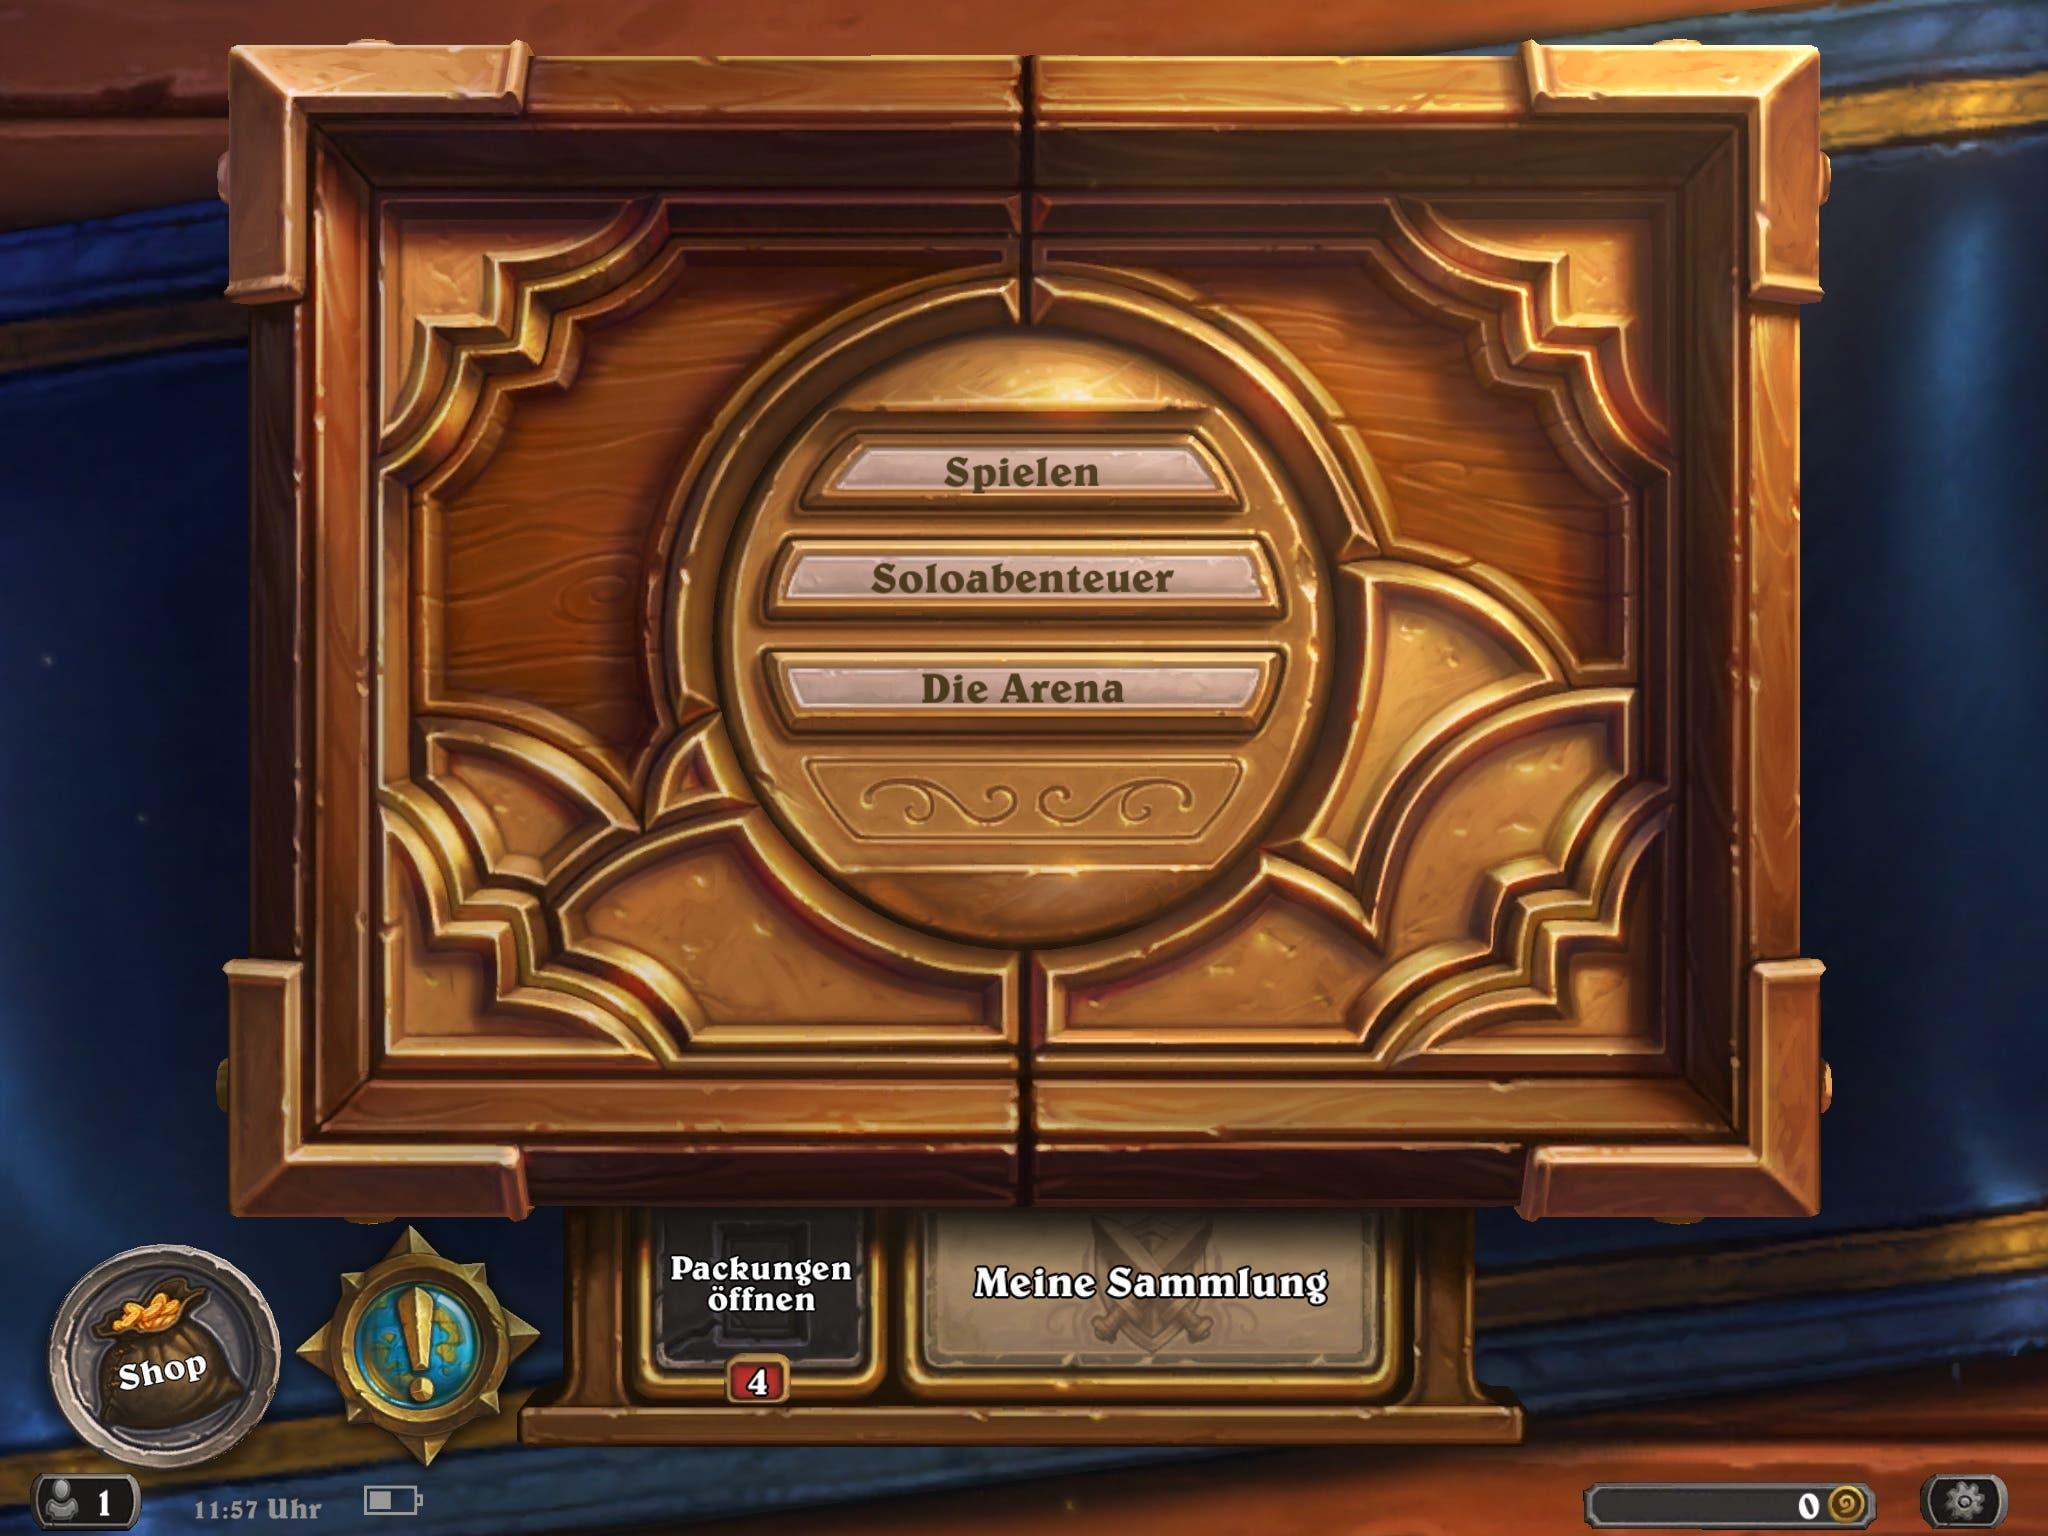 Blizzard Hearthstone iOS